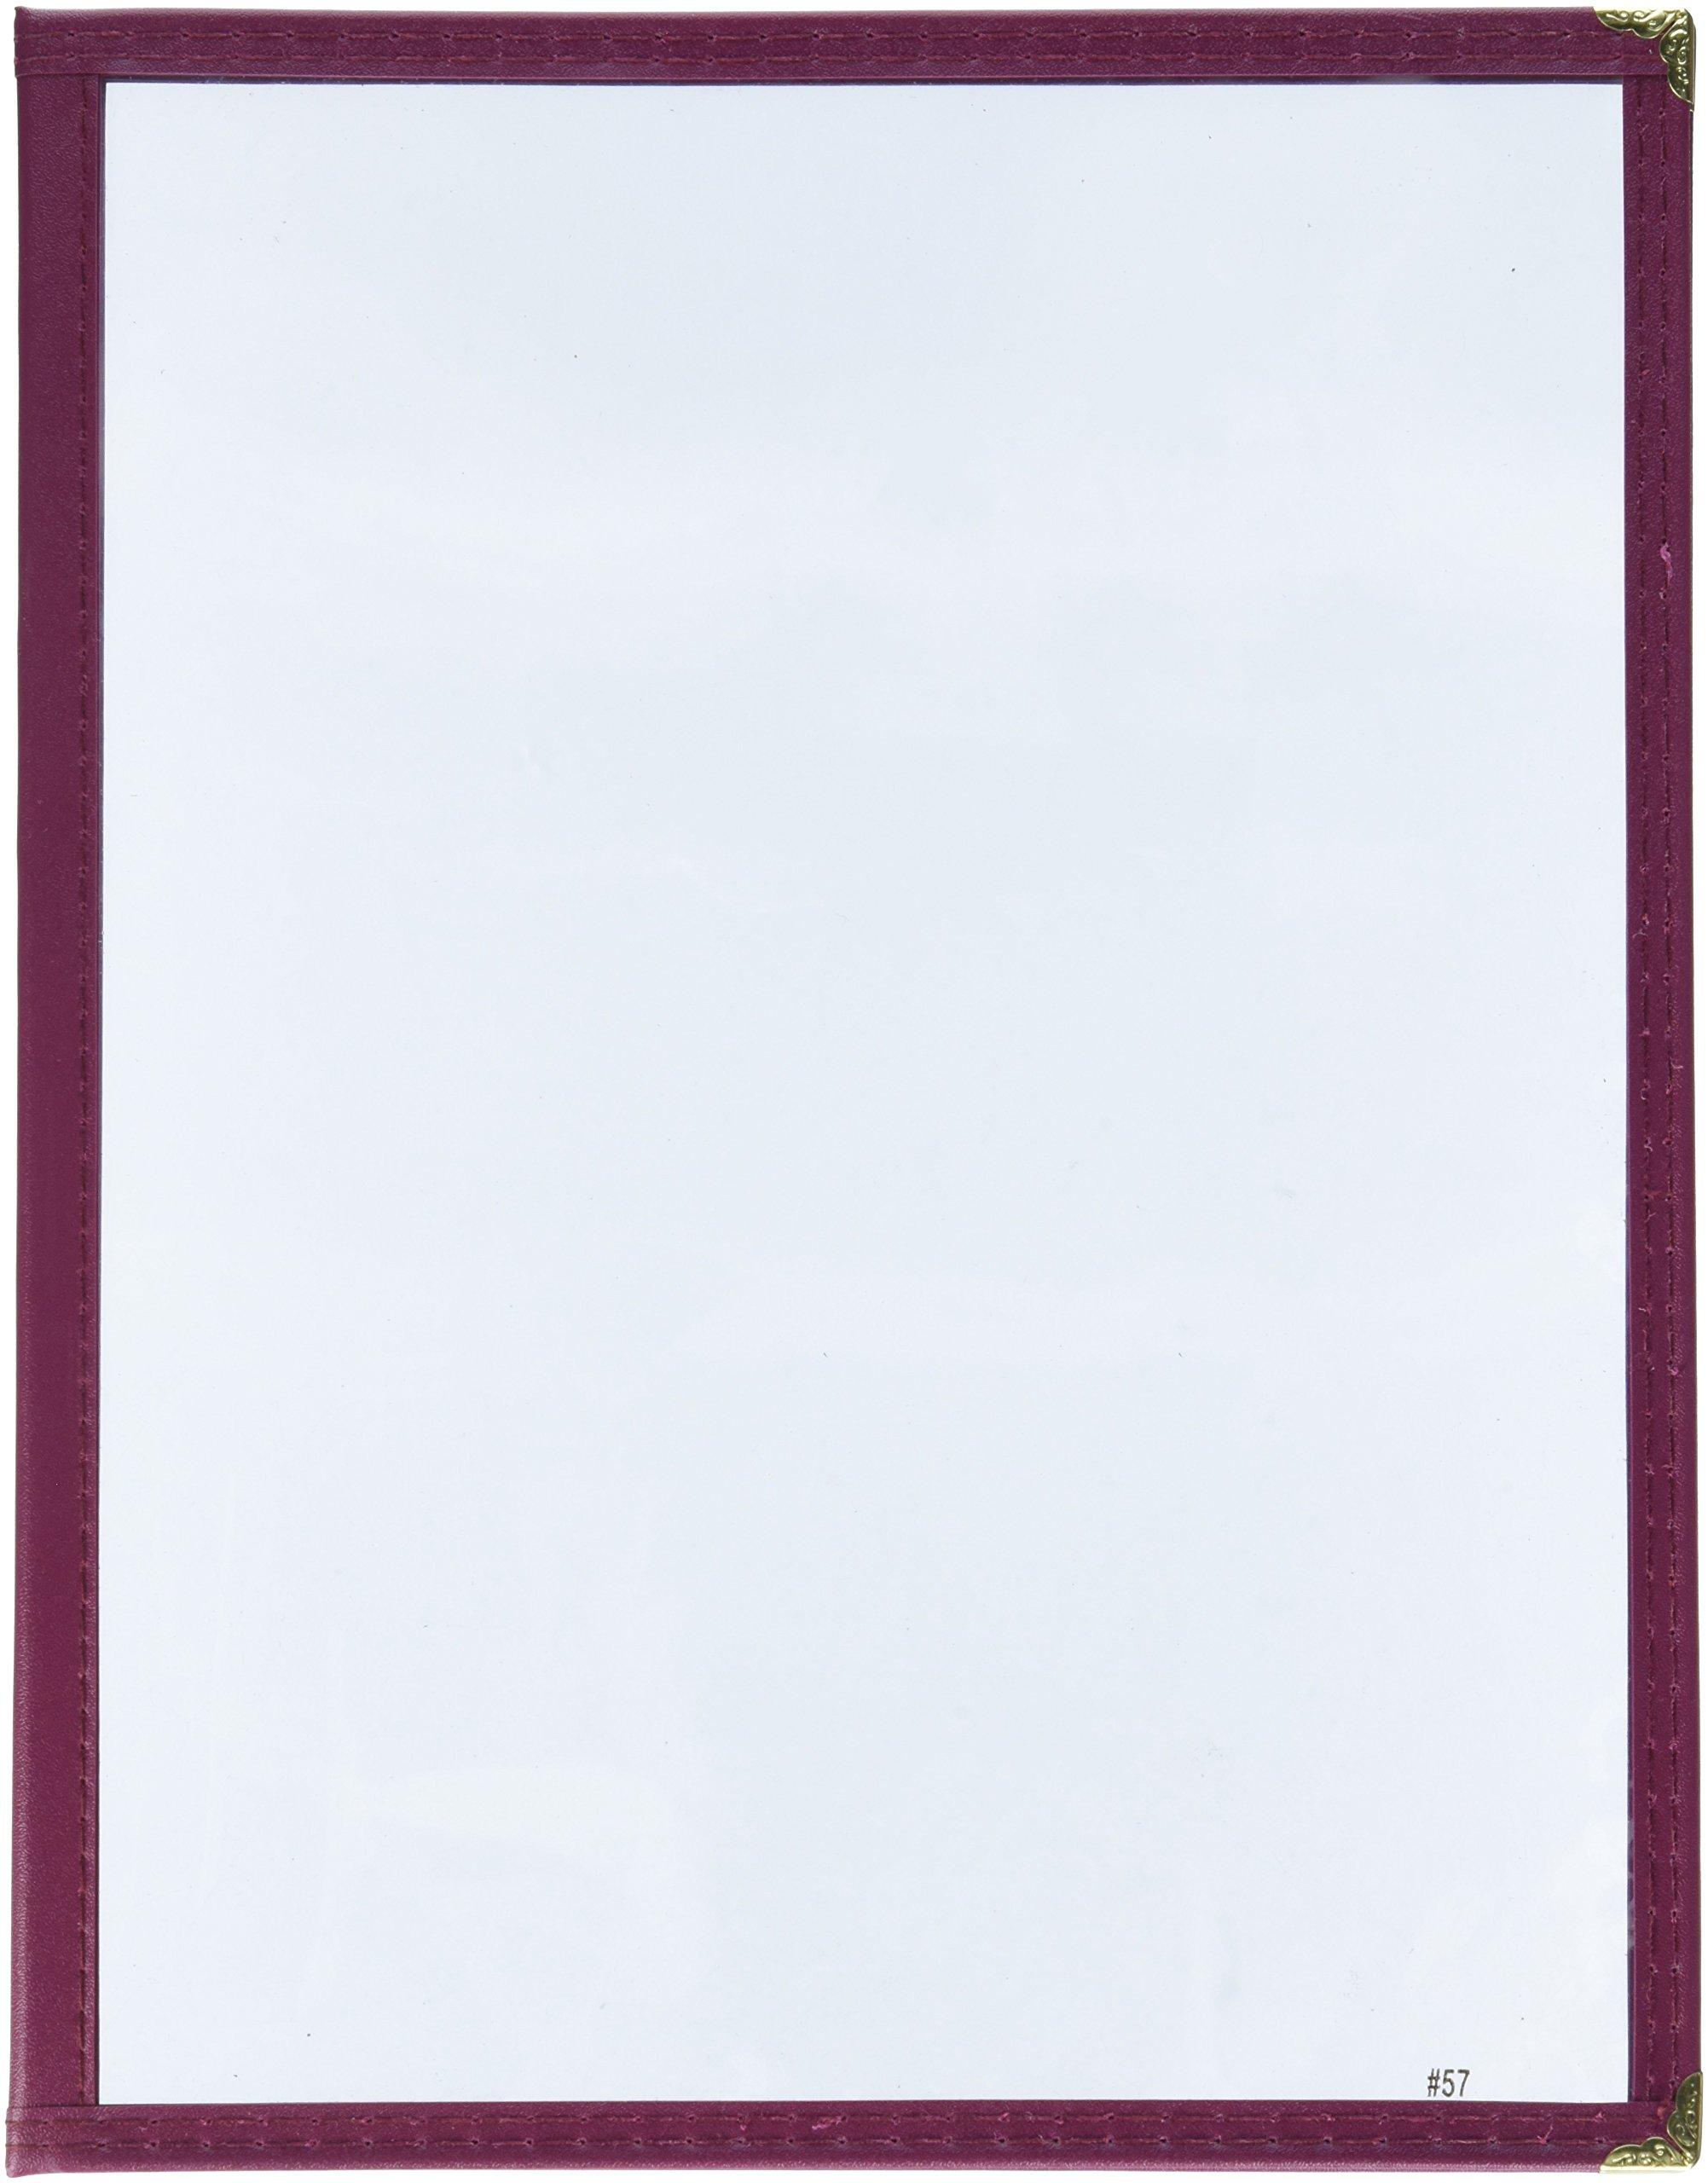 Winco Double Fold Menu Cover, 12-Inch x 9.5-Inch, Burgundy